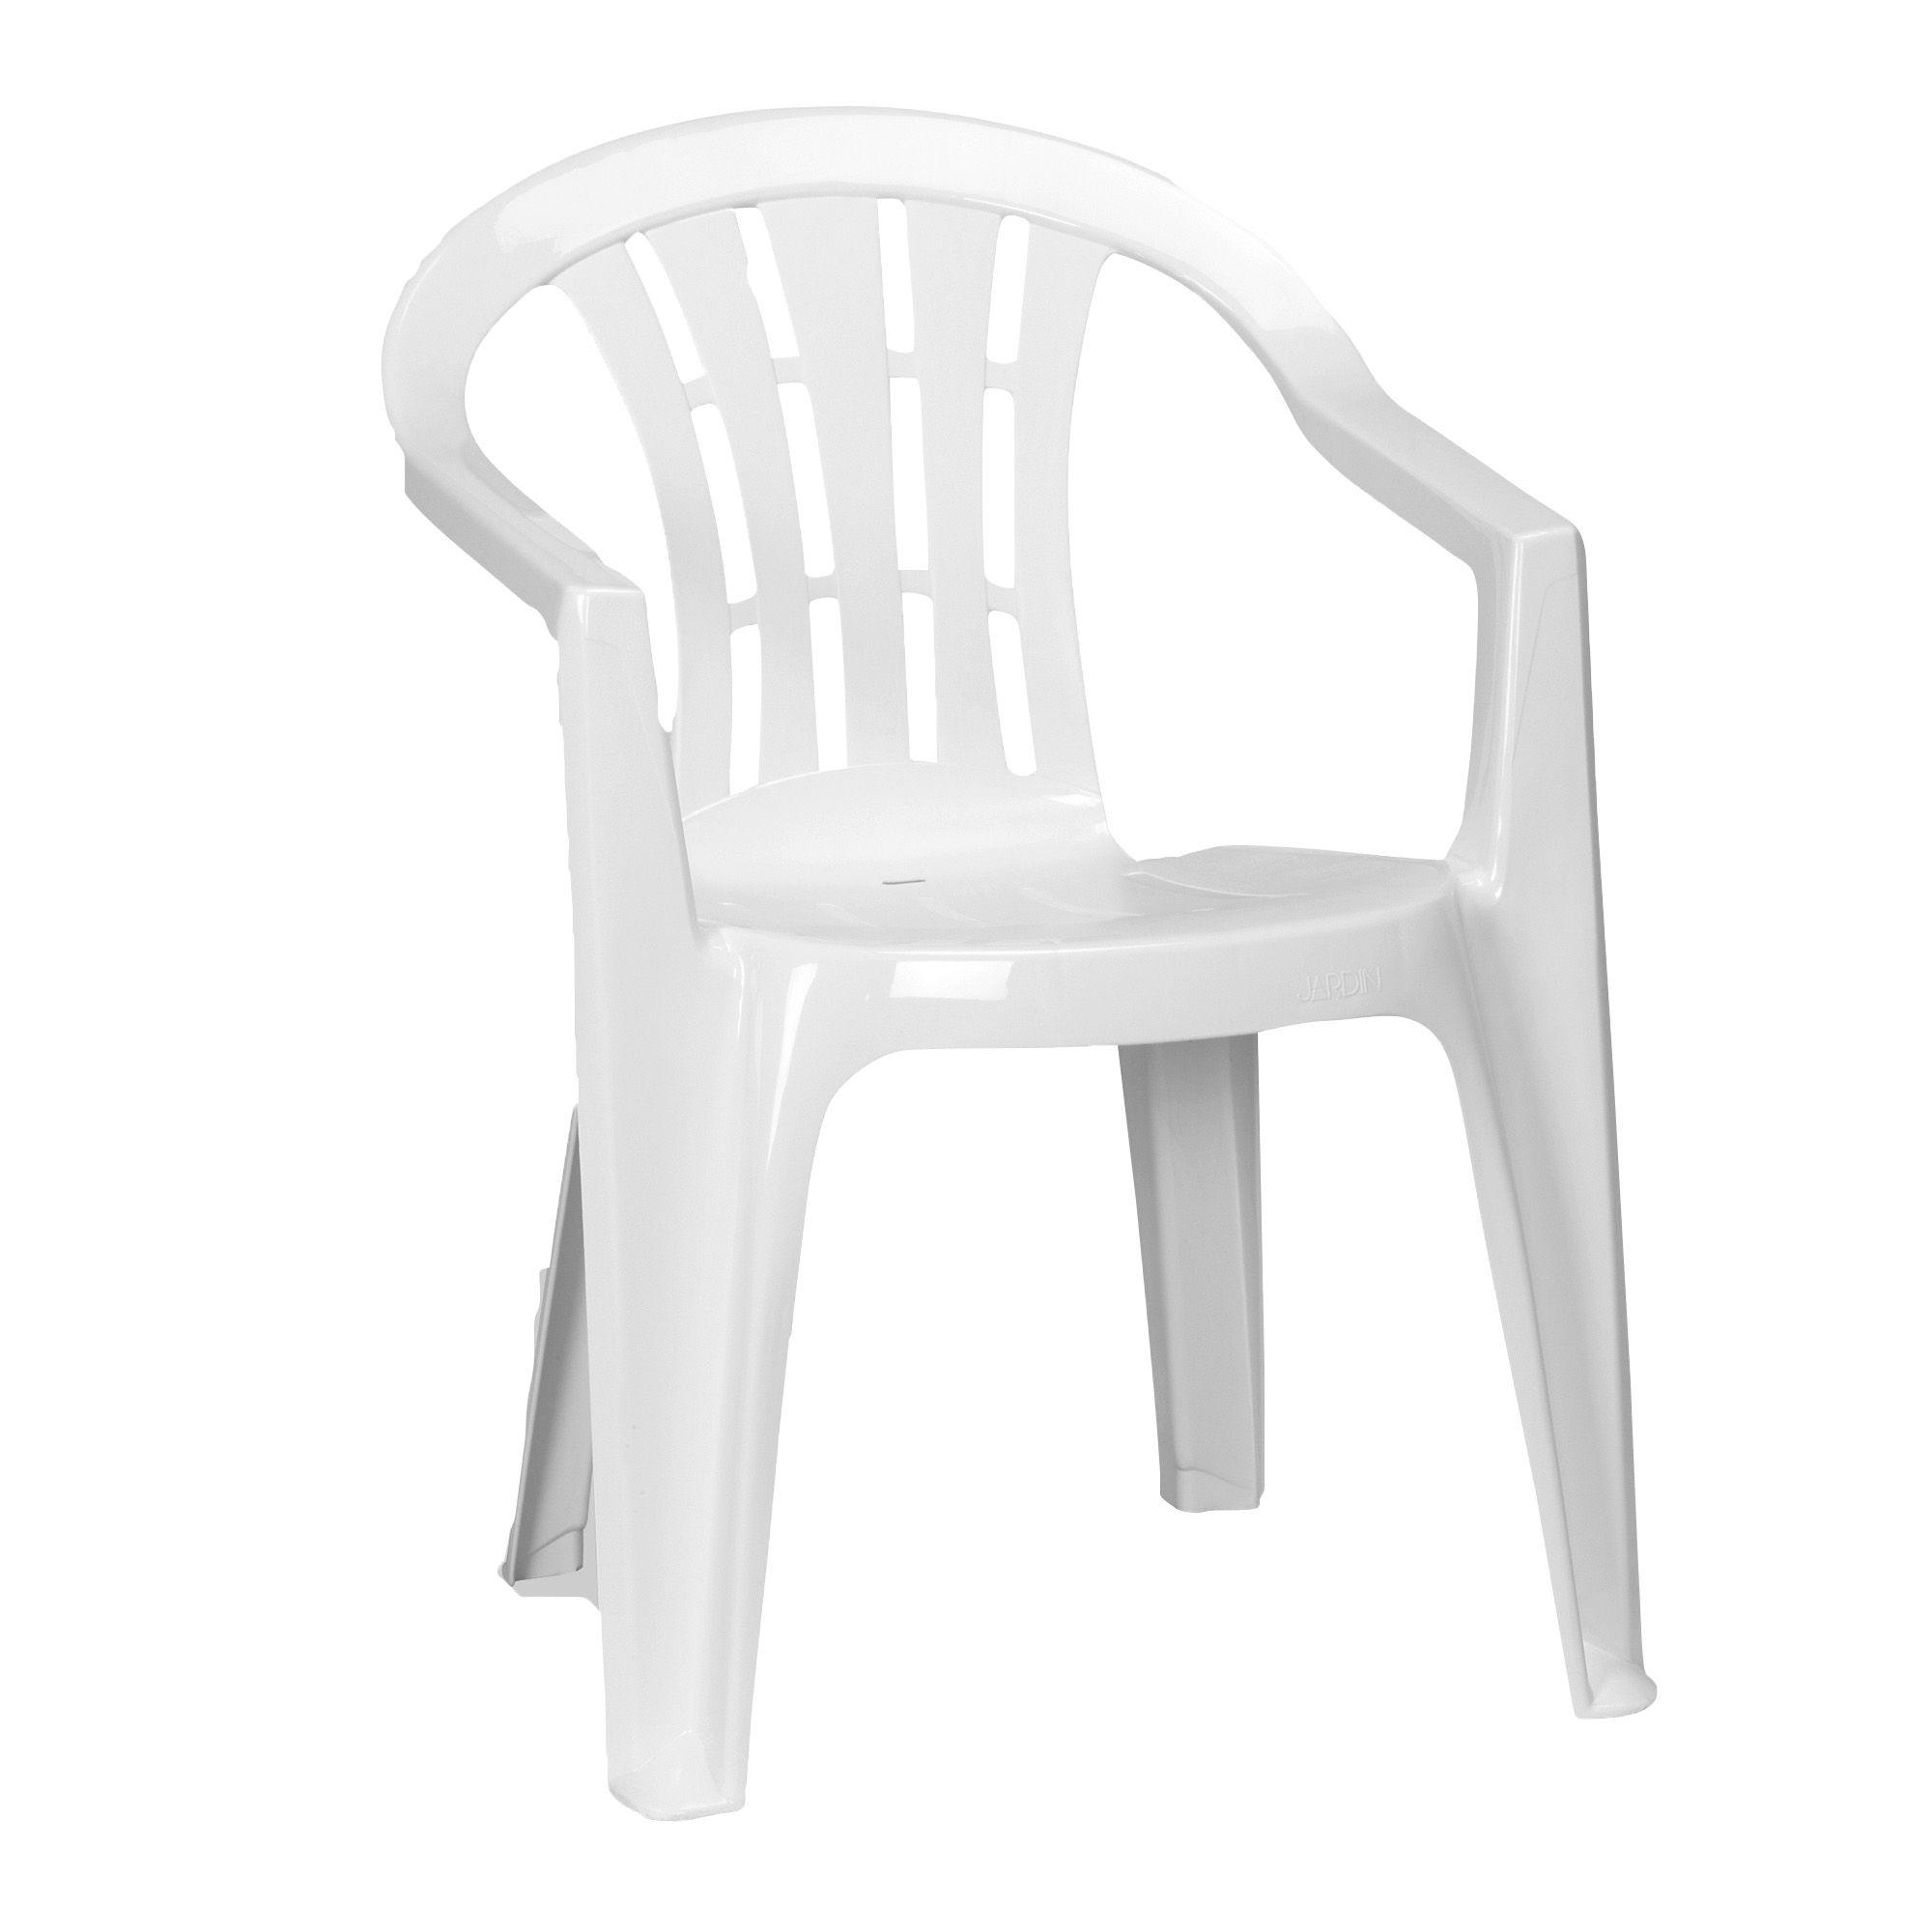 Patio Chair Hire Dorset  Devon  Somerset  Patio